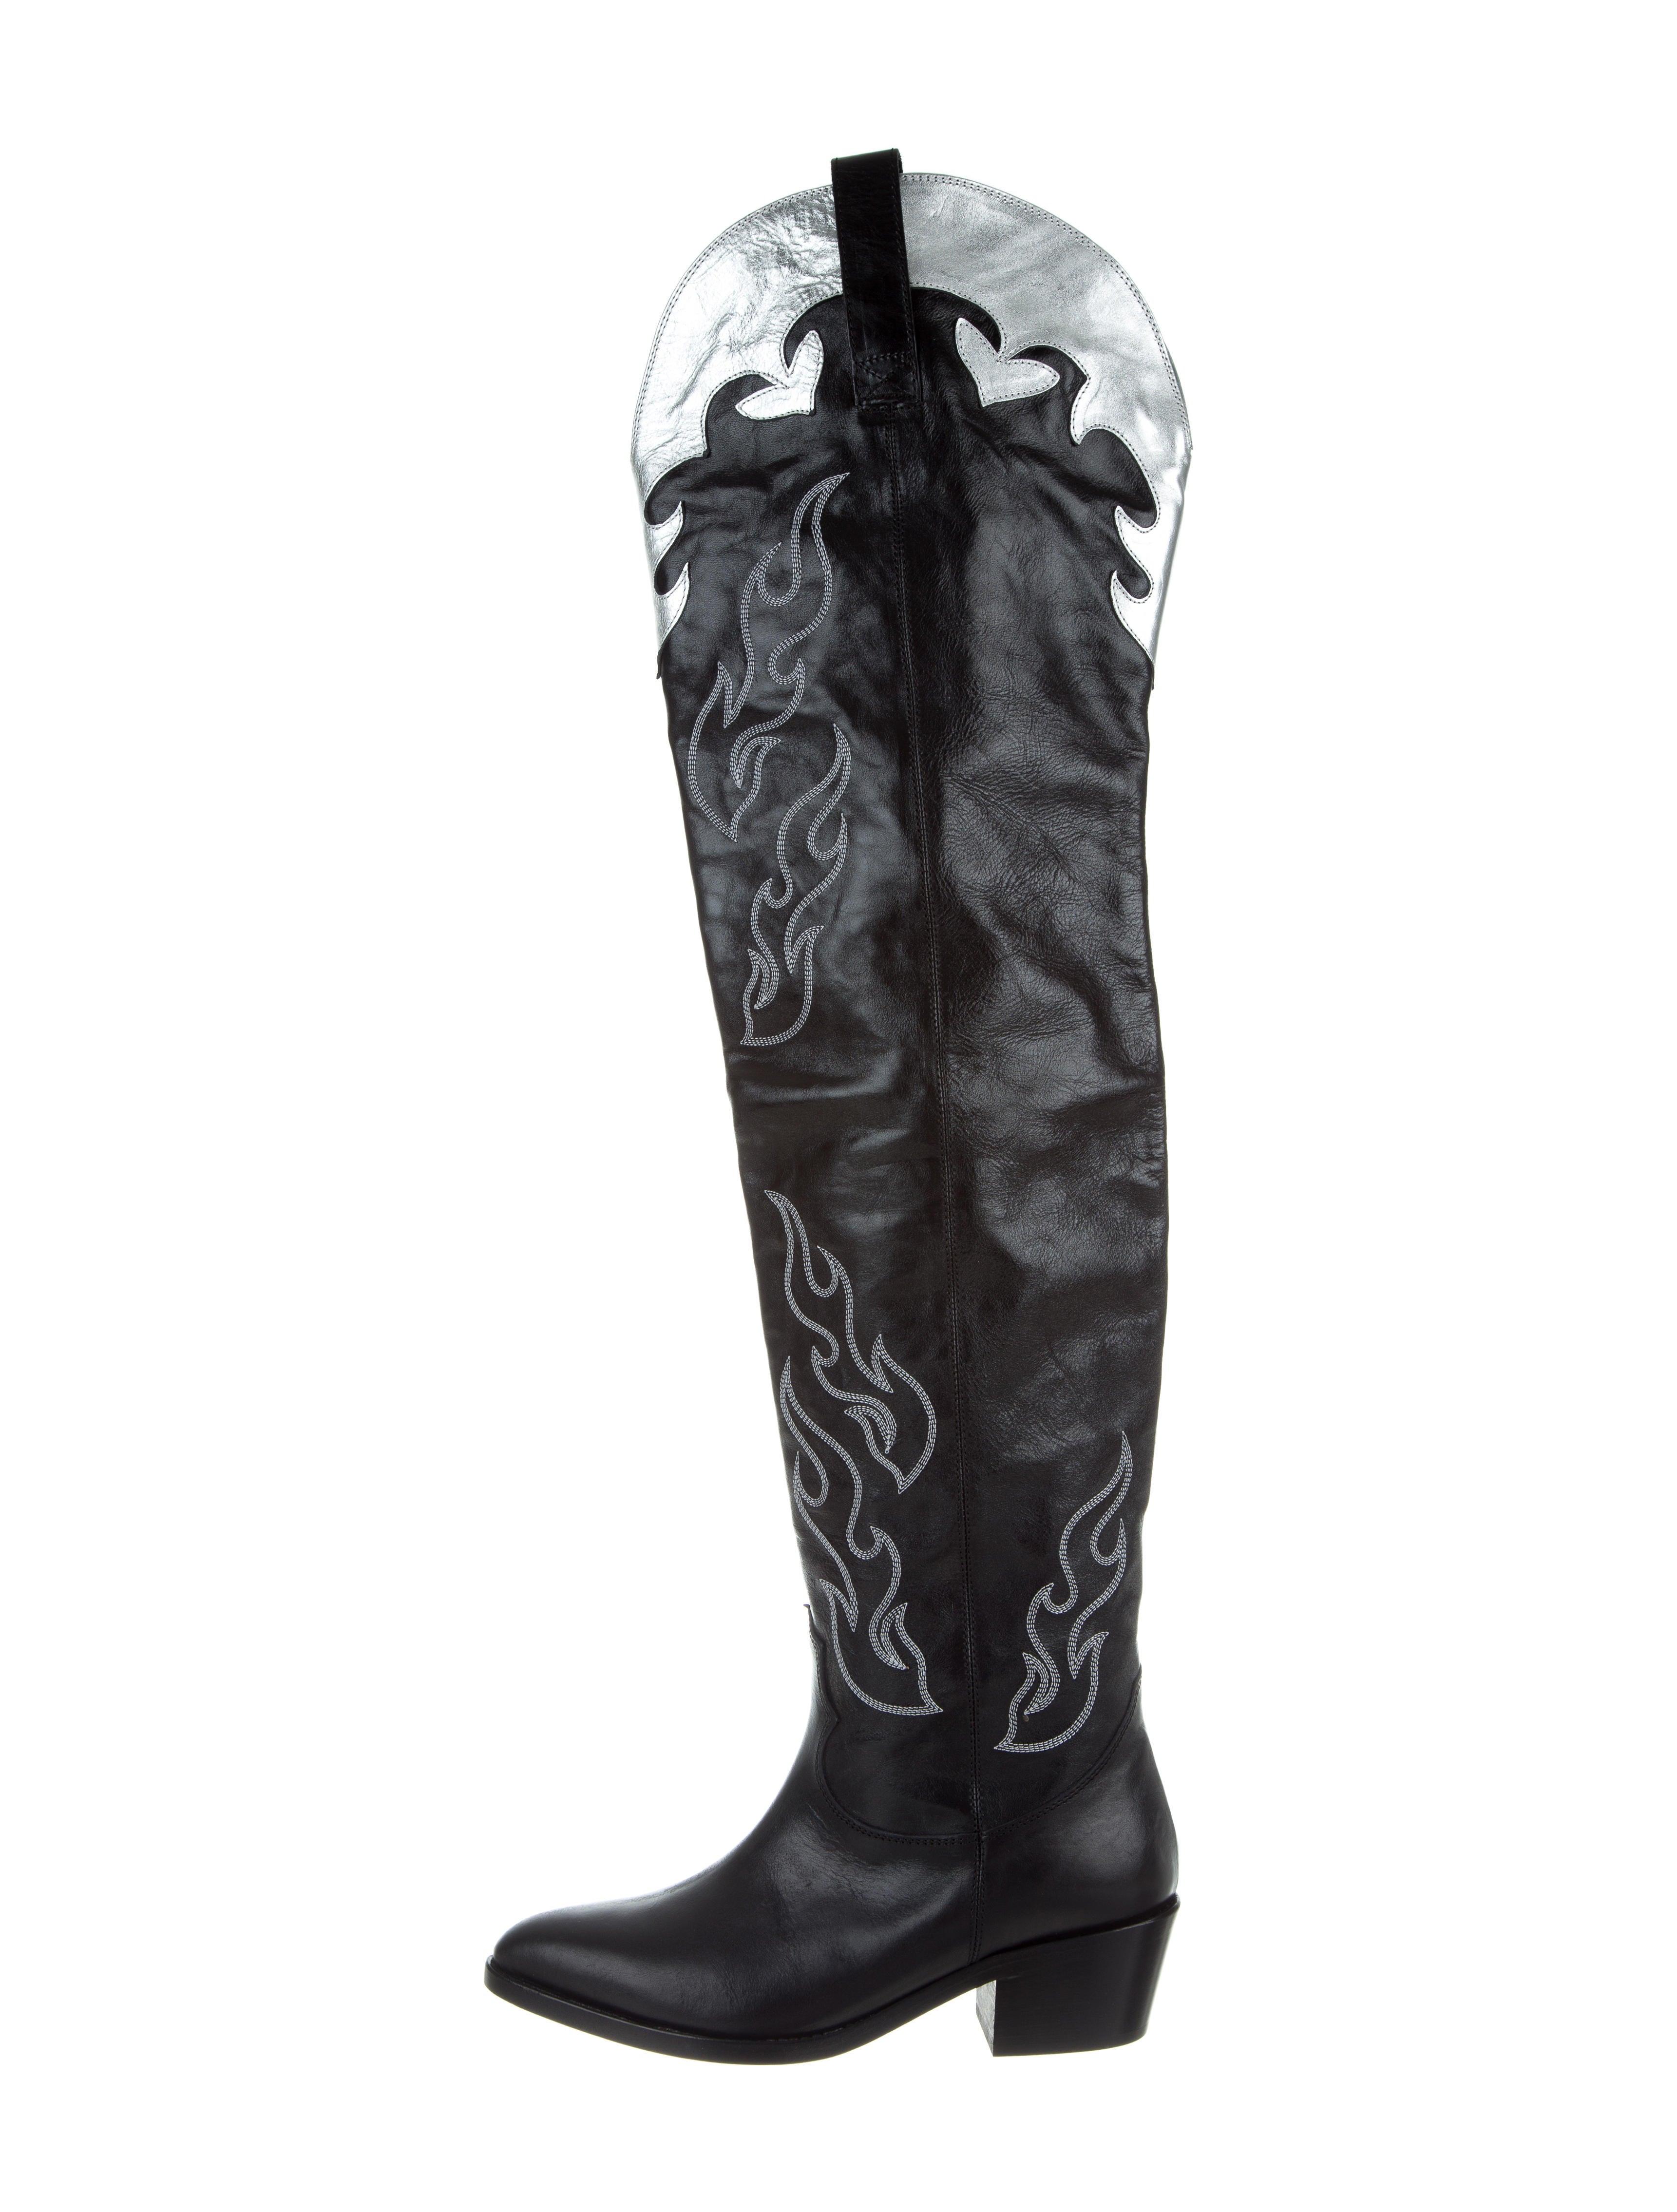 Chiara Ferragni Thigh High Cowboy Boots W Tags Shoes